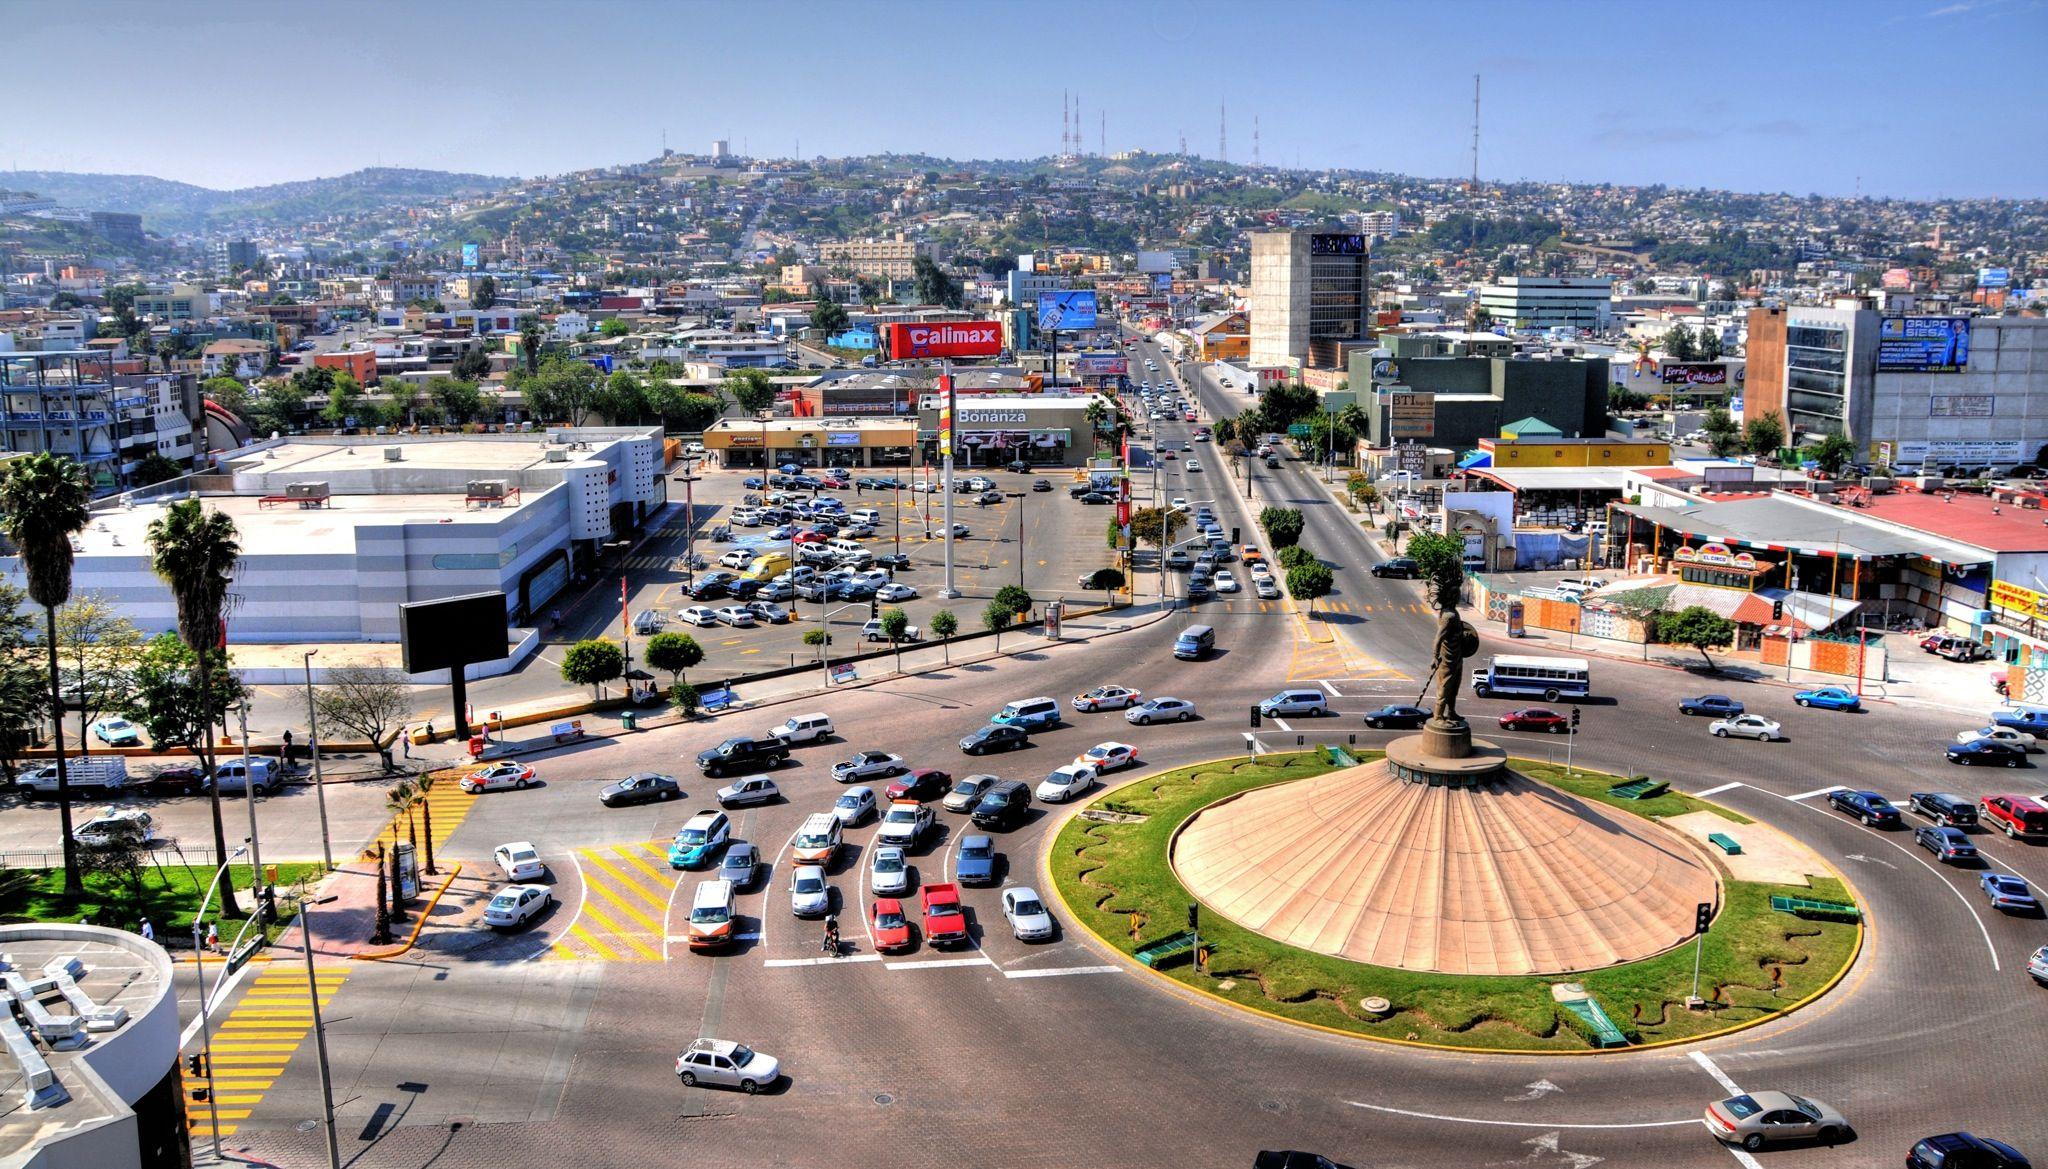 Vista de Tijuana